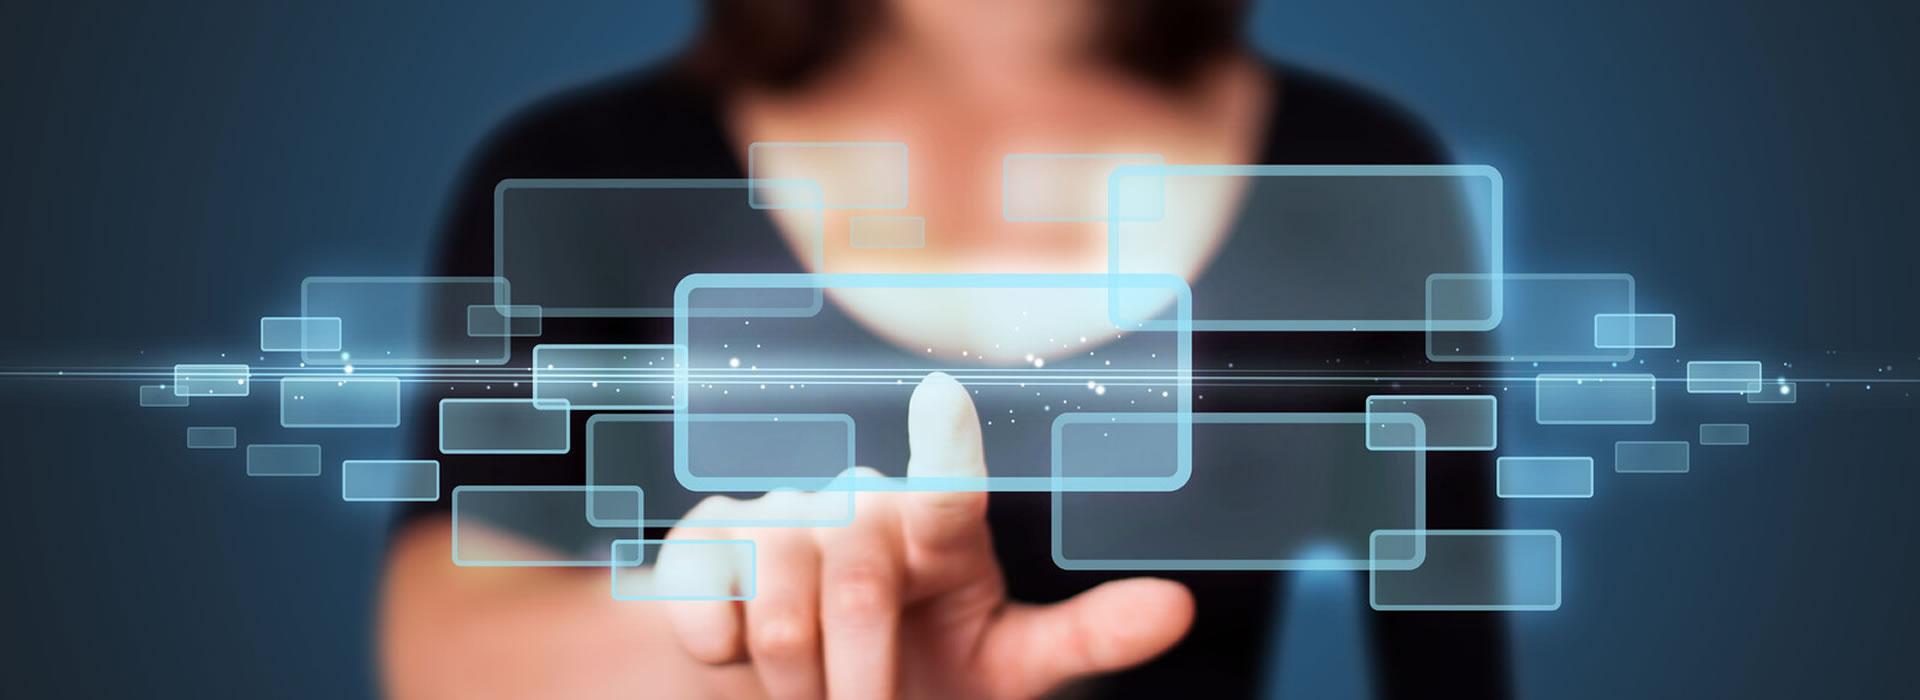 https://aldercomputerwebdesign.com.au/images/newslidetechwoman.jpg